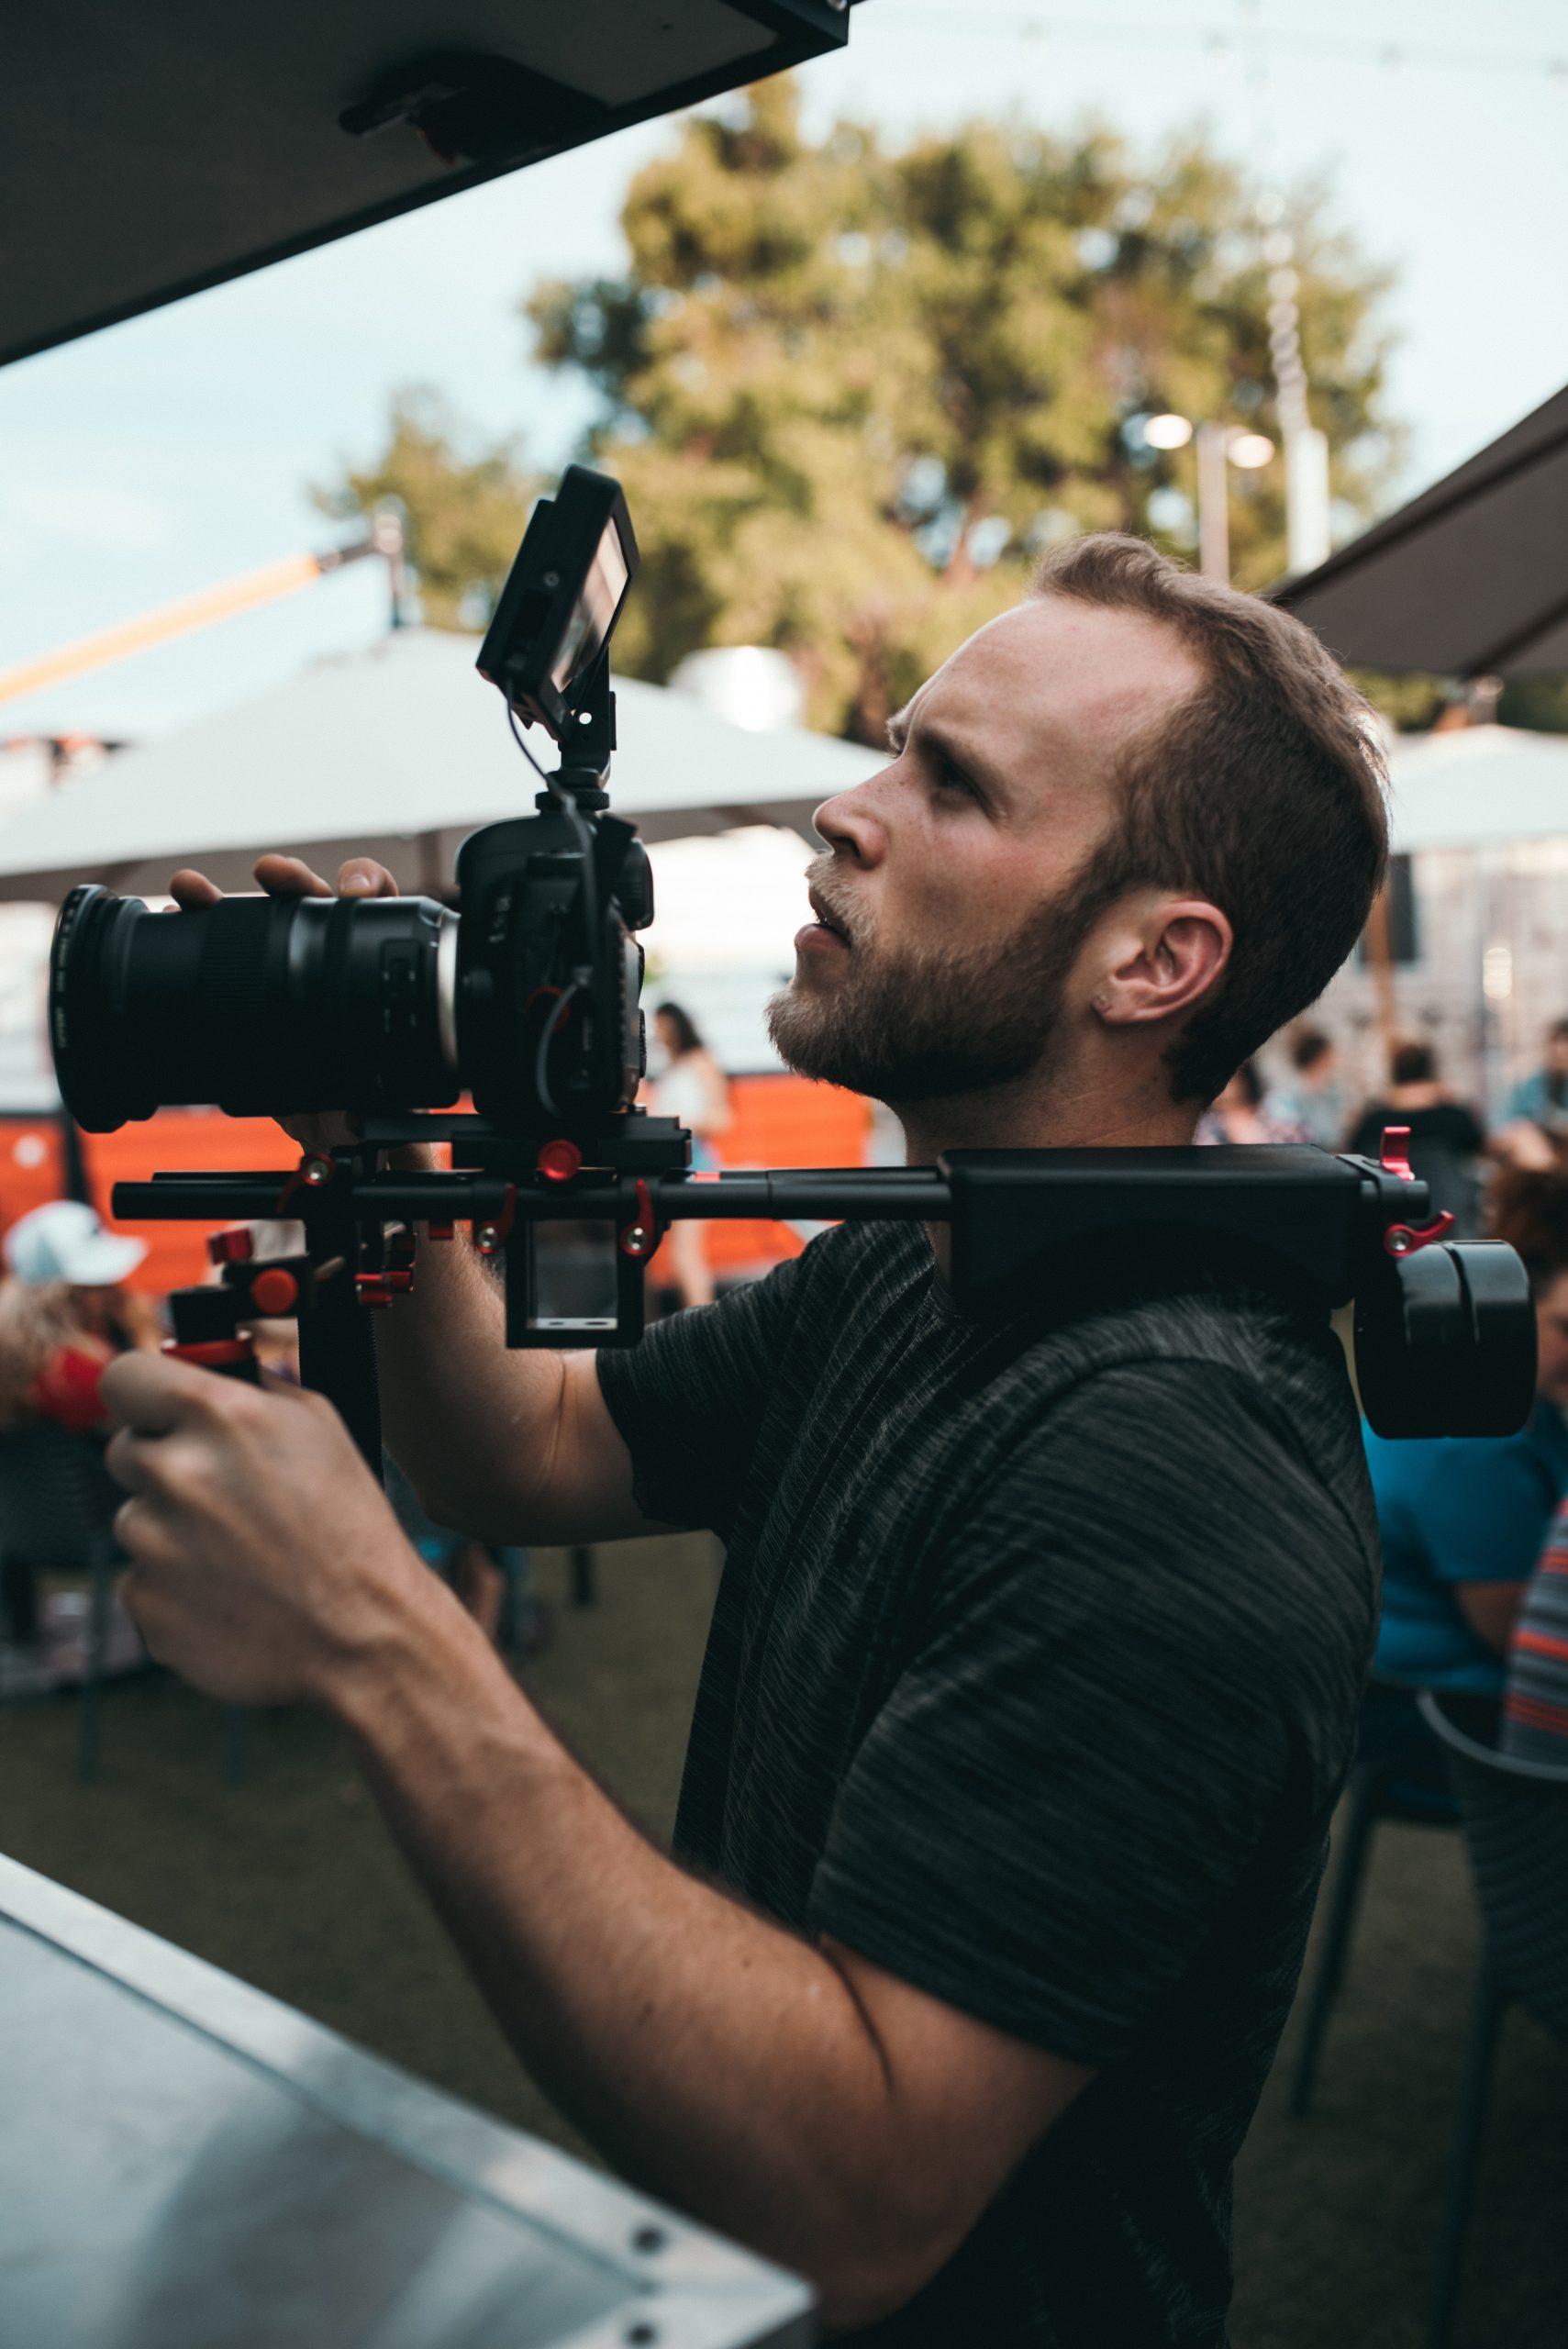 action-camera-camera-crew-2397606